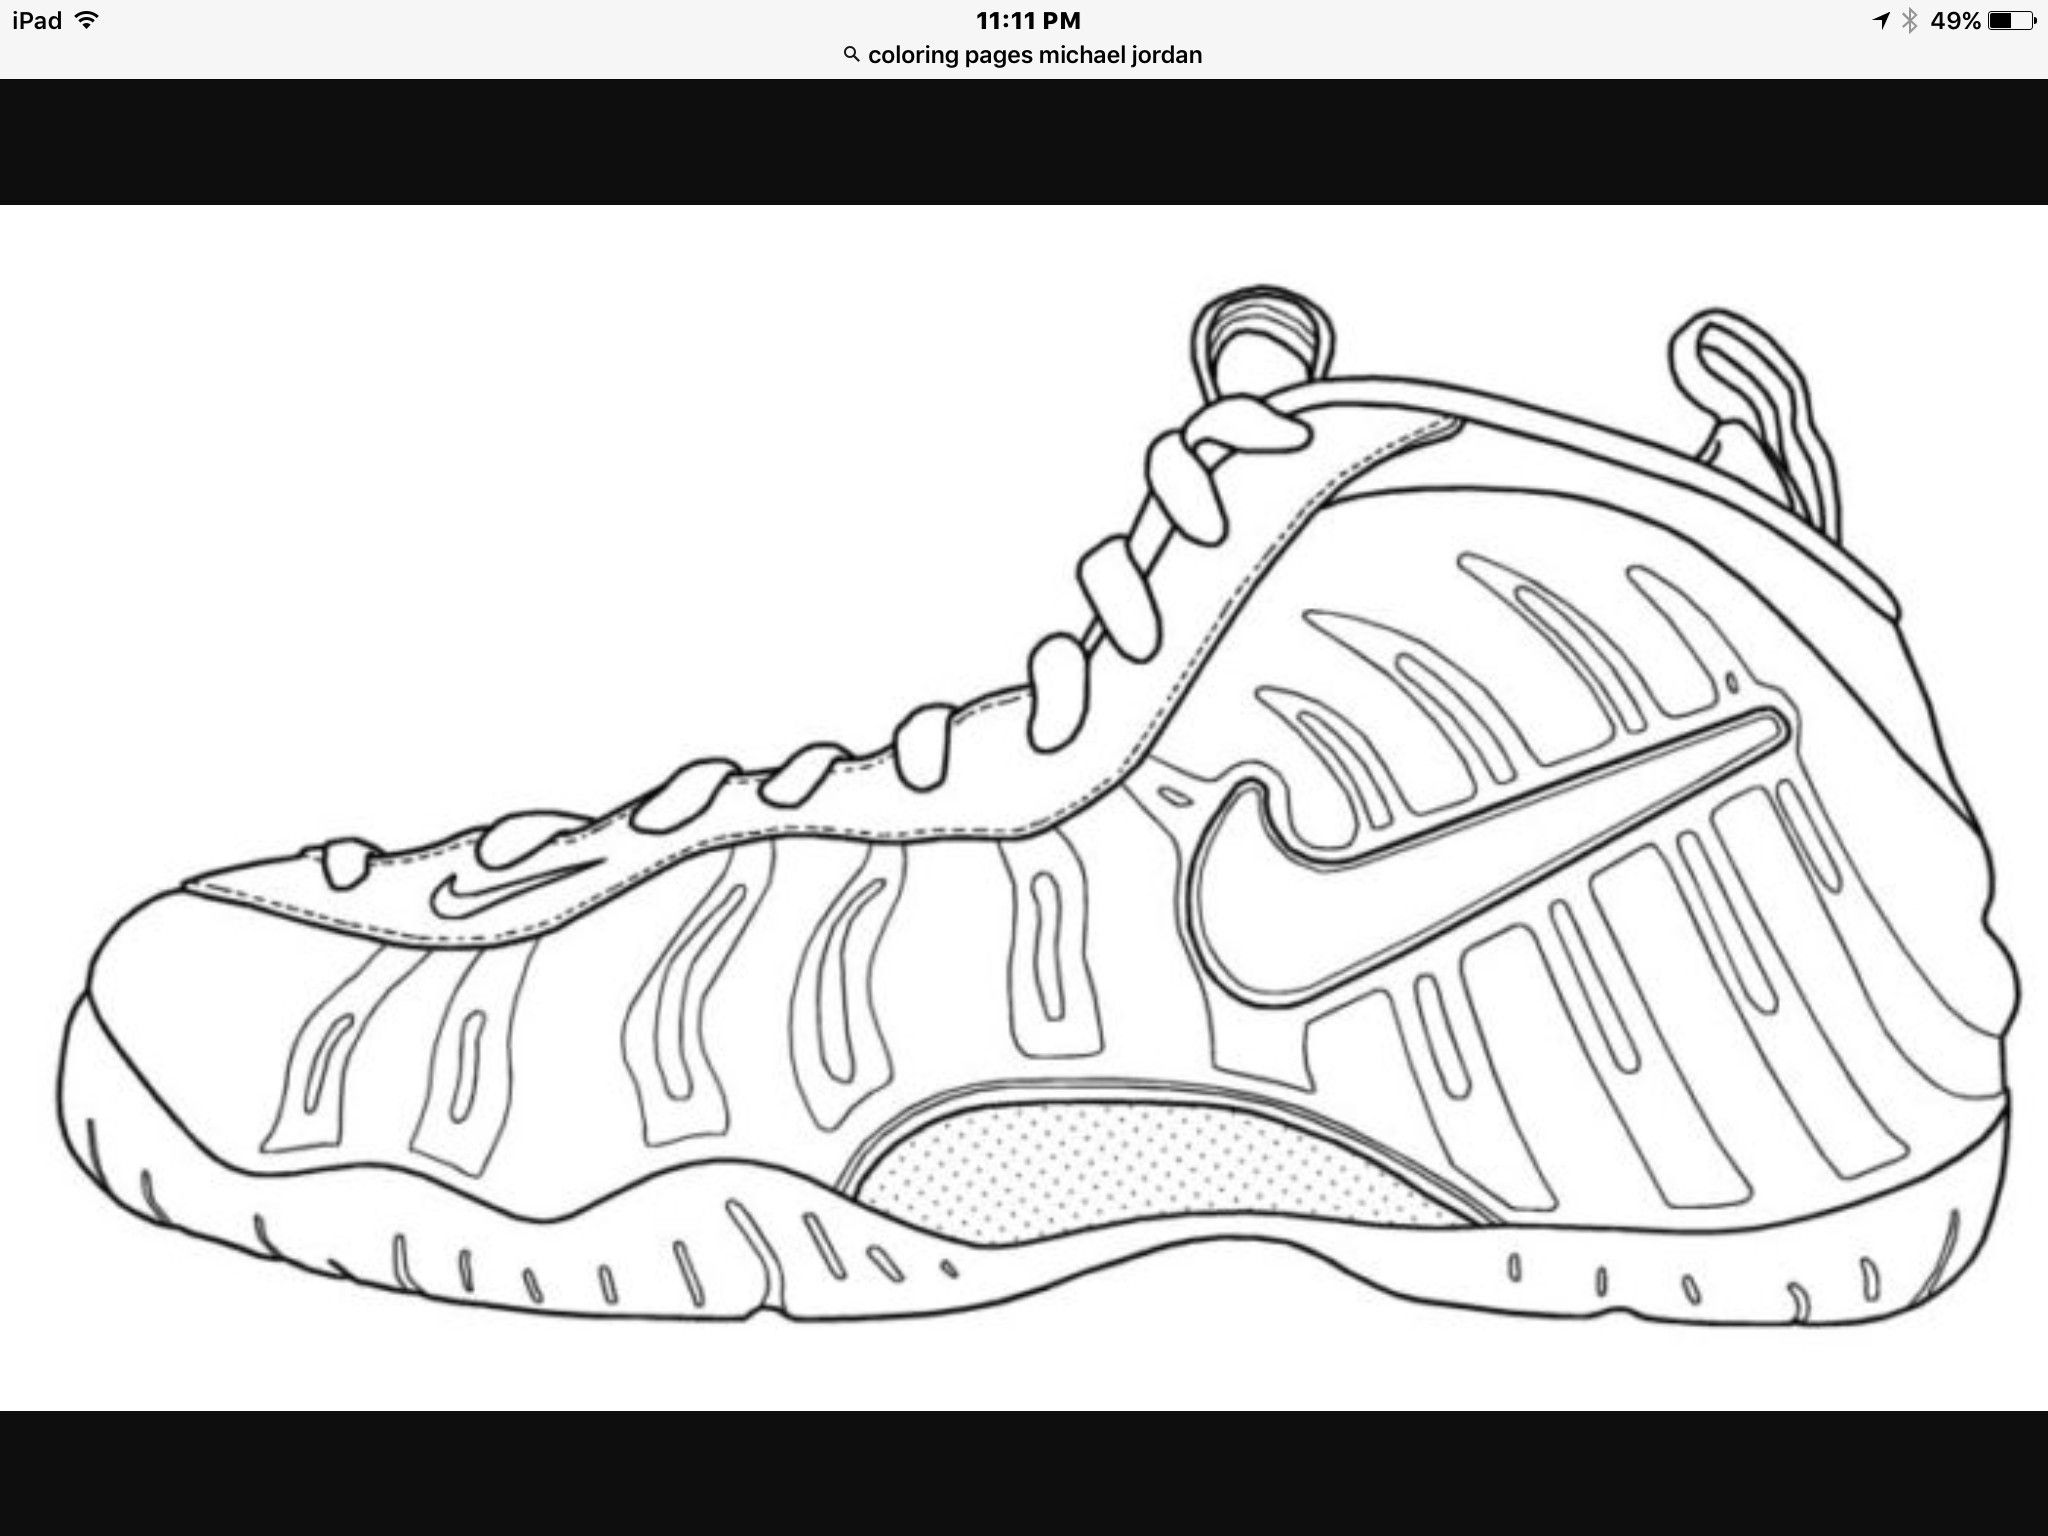 Jordan Shoe Coloring Book Fresh Coloring Pages 45 Astonishing Air Jordan Coloring Pages In 2020 Sneakers Sketch Sneakers Drawing Shoe Template